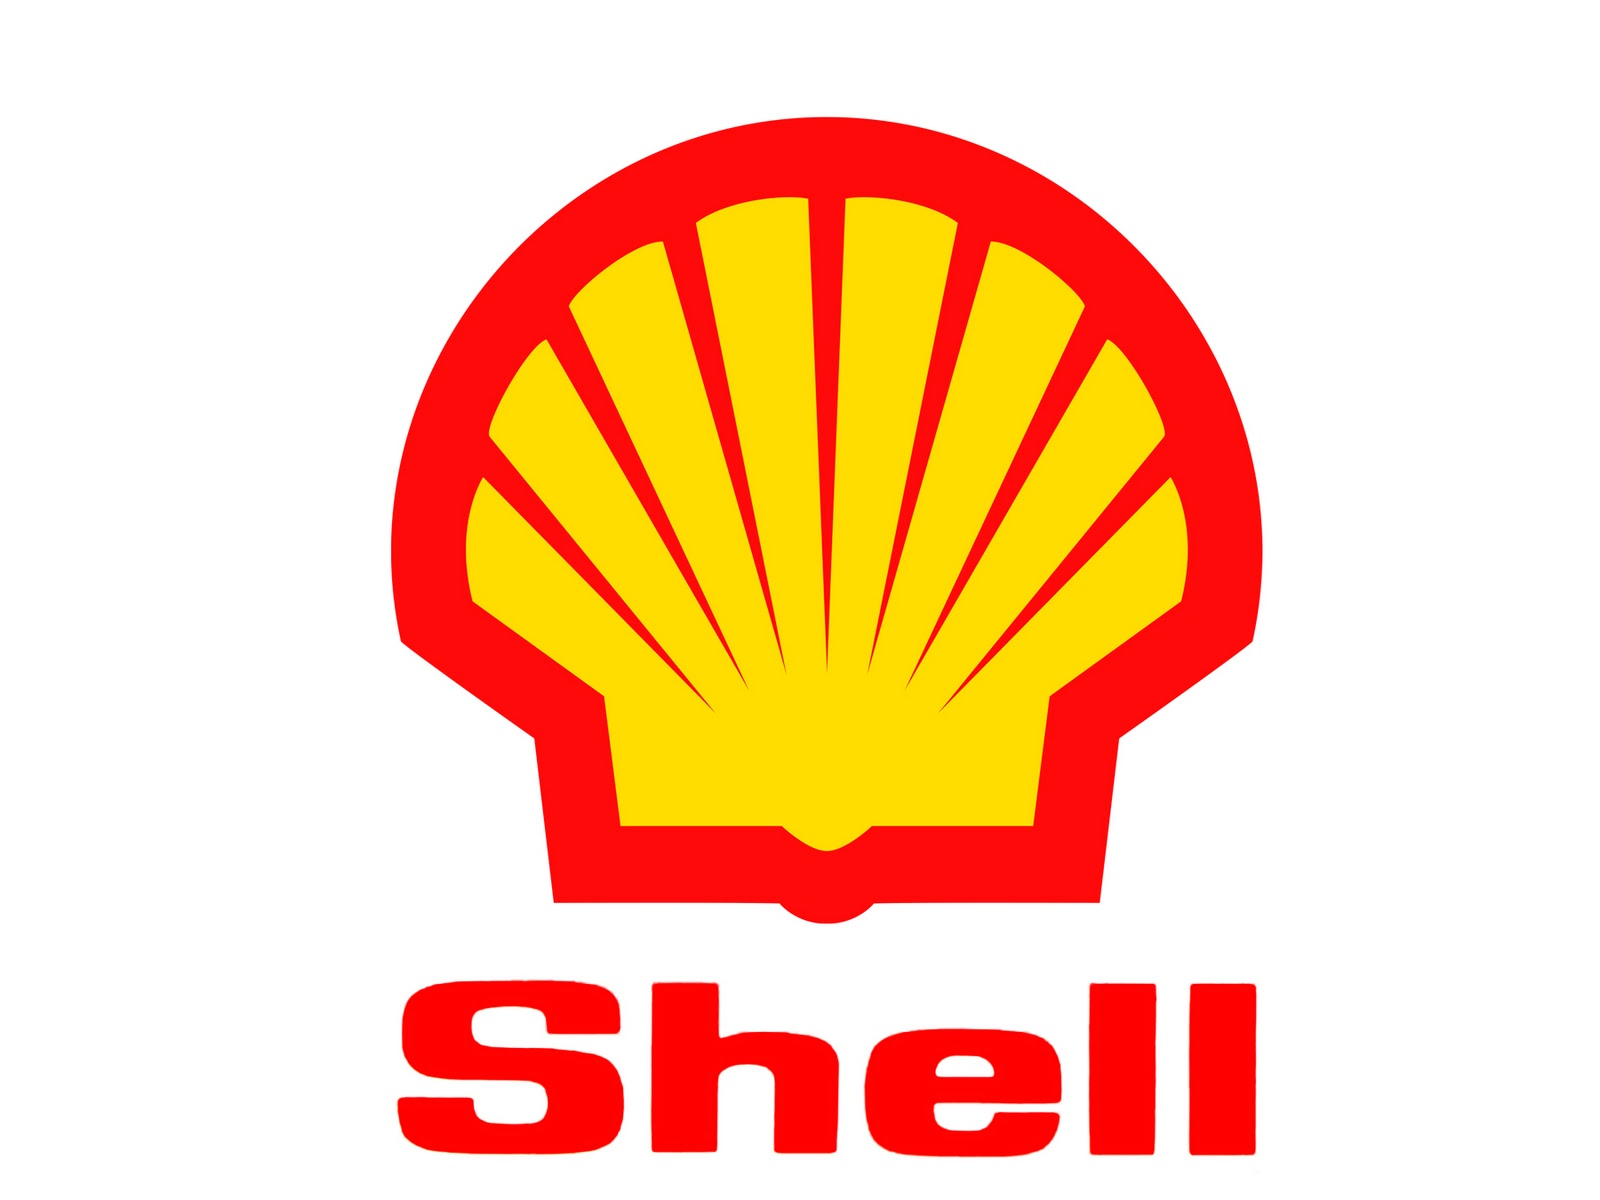 shell之磁盘初始化脚本